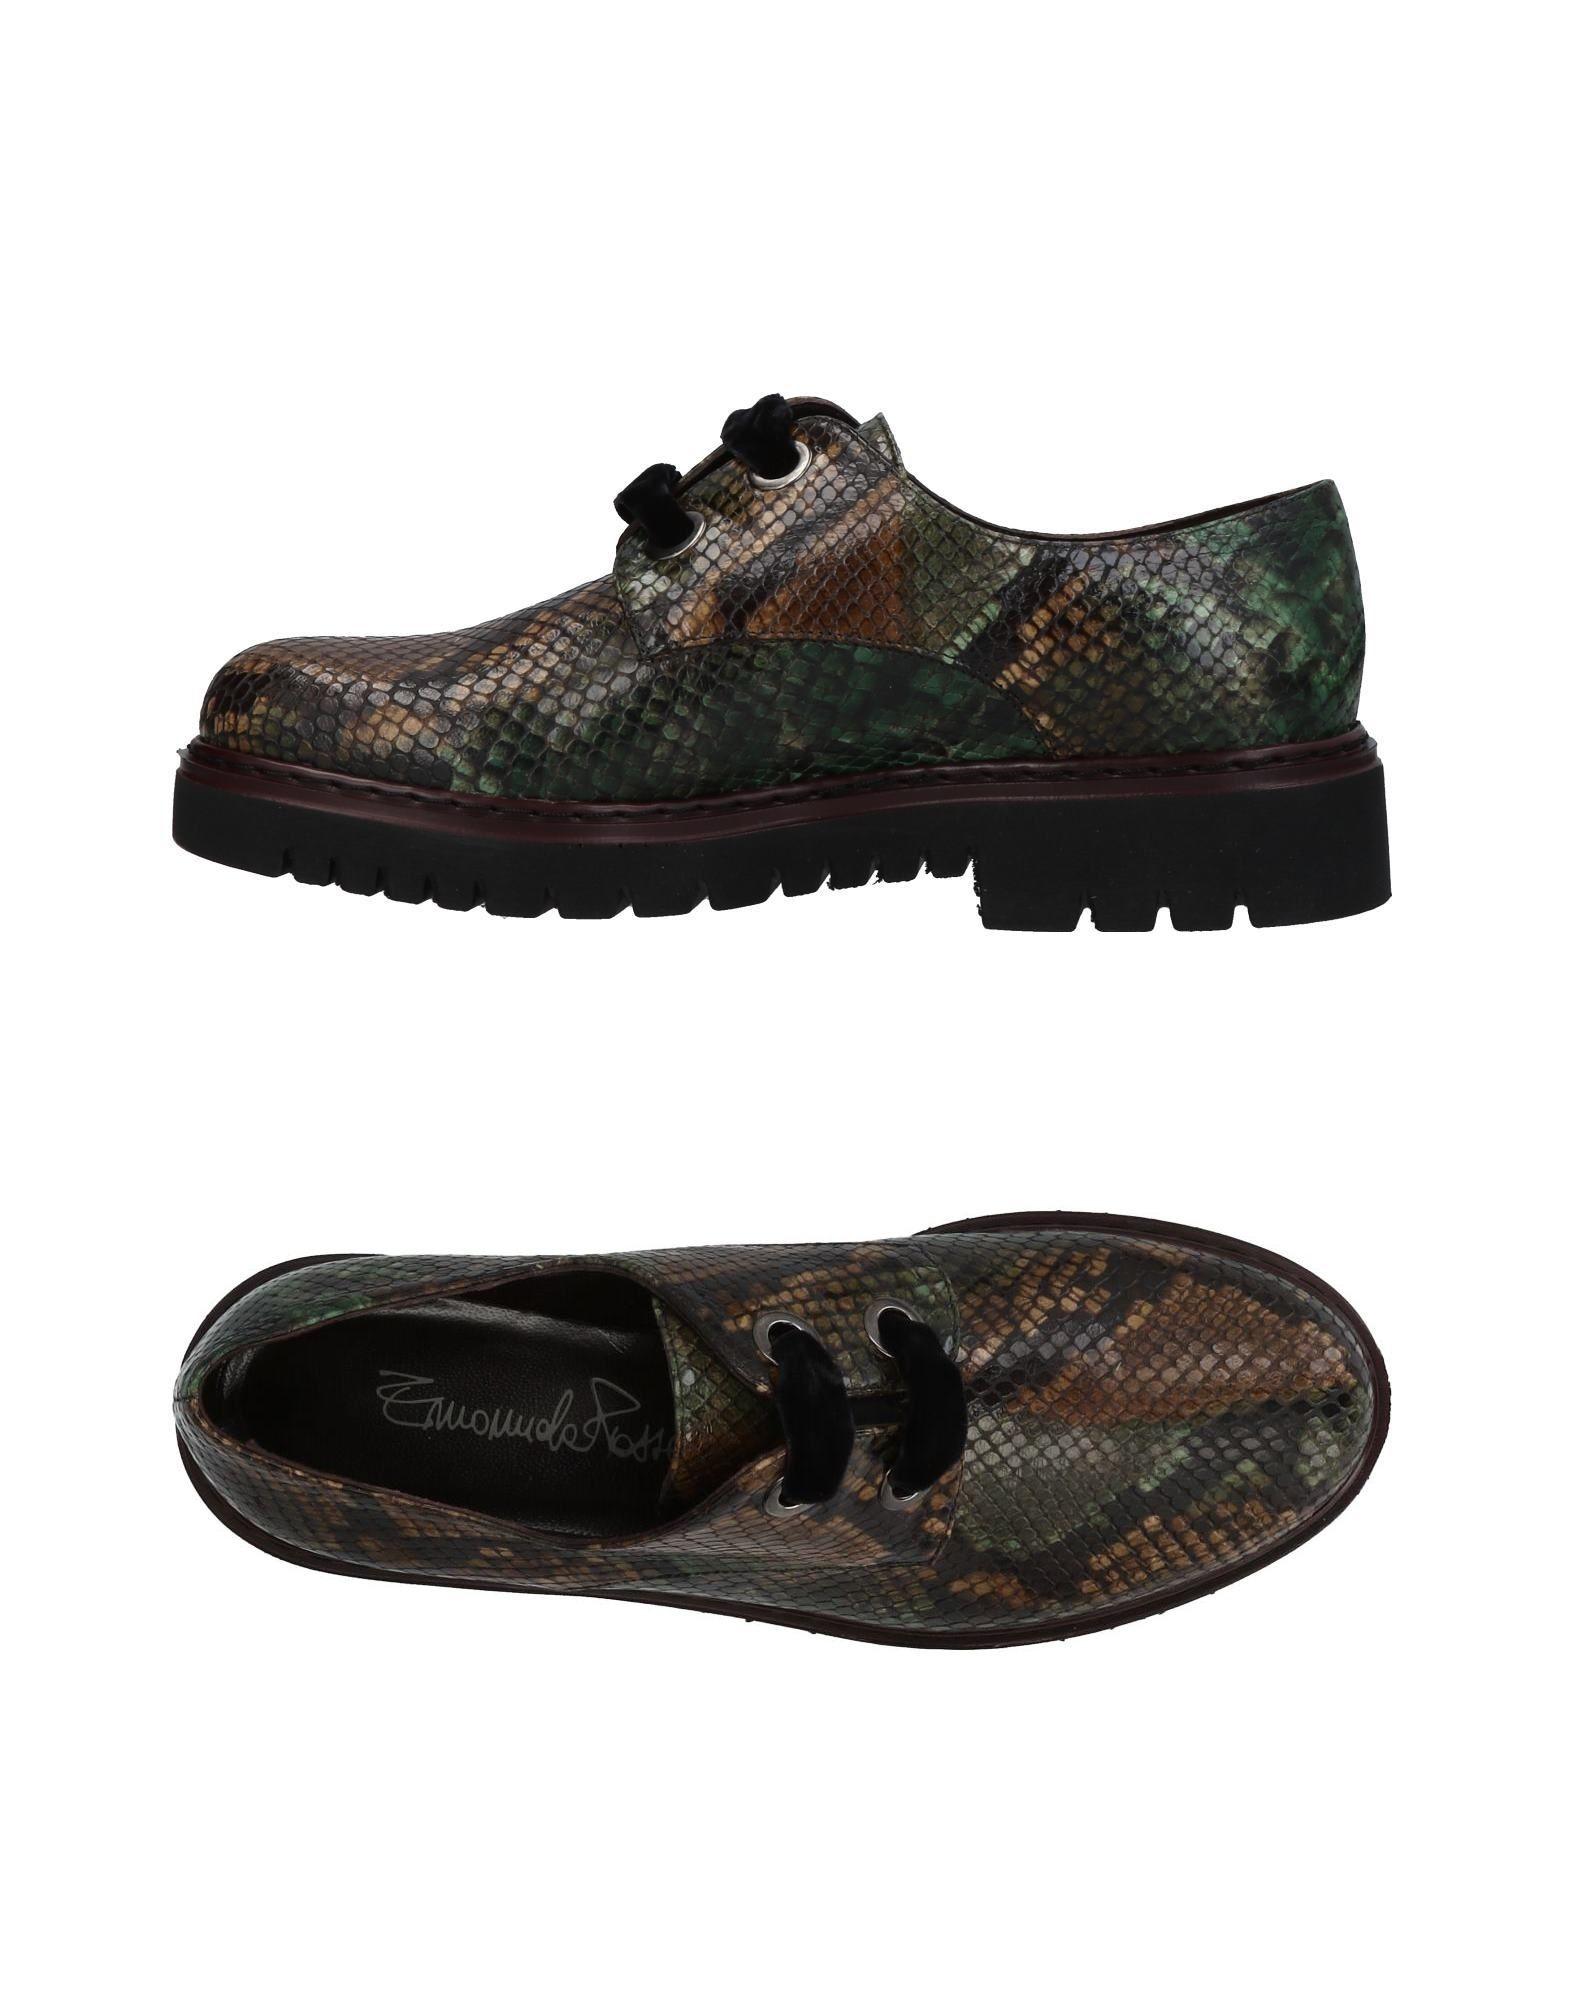 Emanuela Passeri Schnürschuhe Damen  11444623RF Gute Qualität beliebte Schuhe